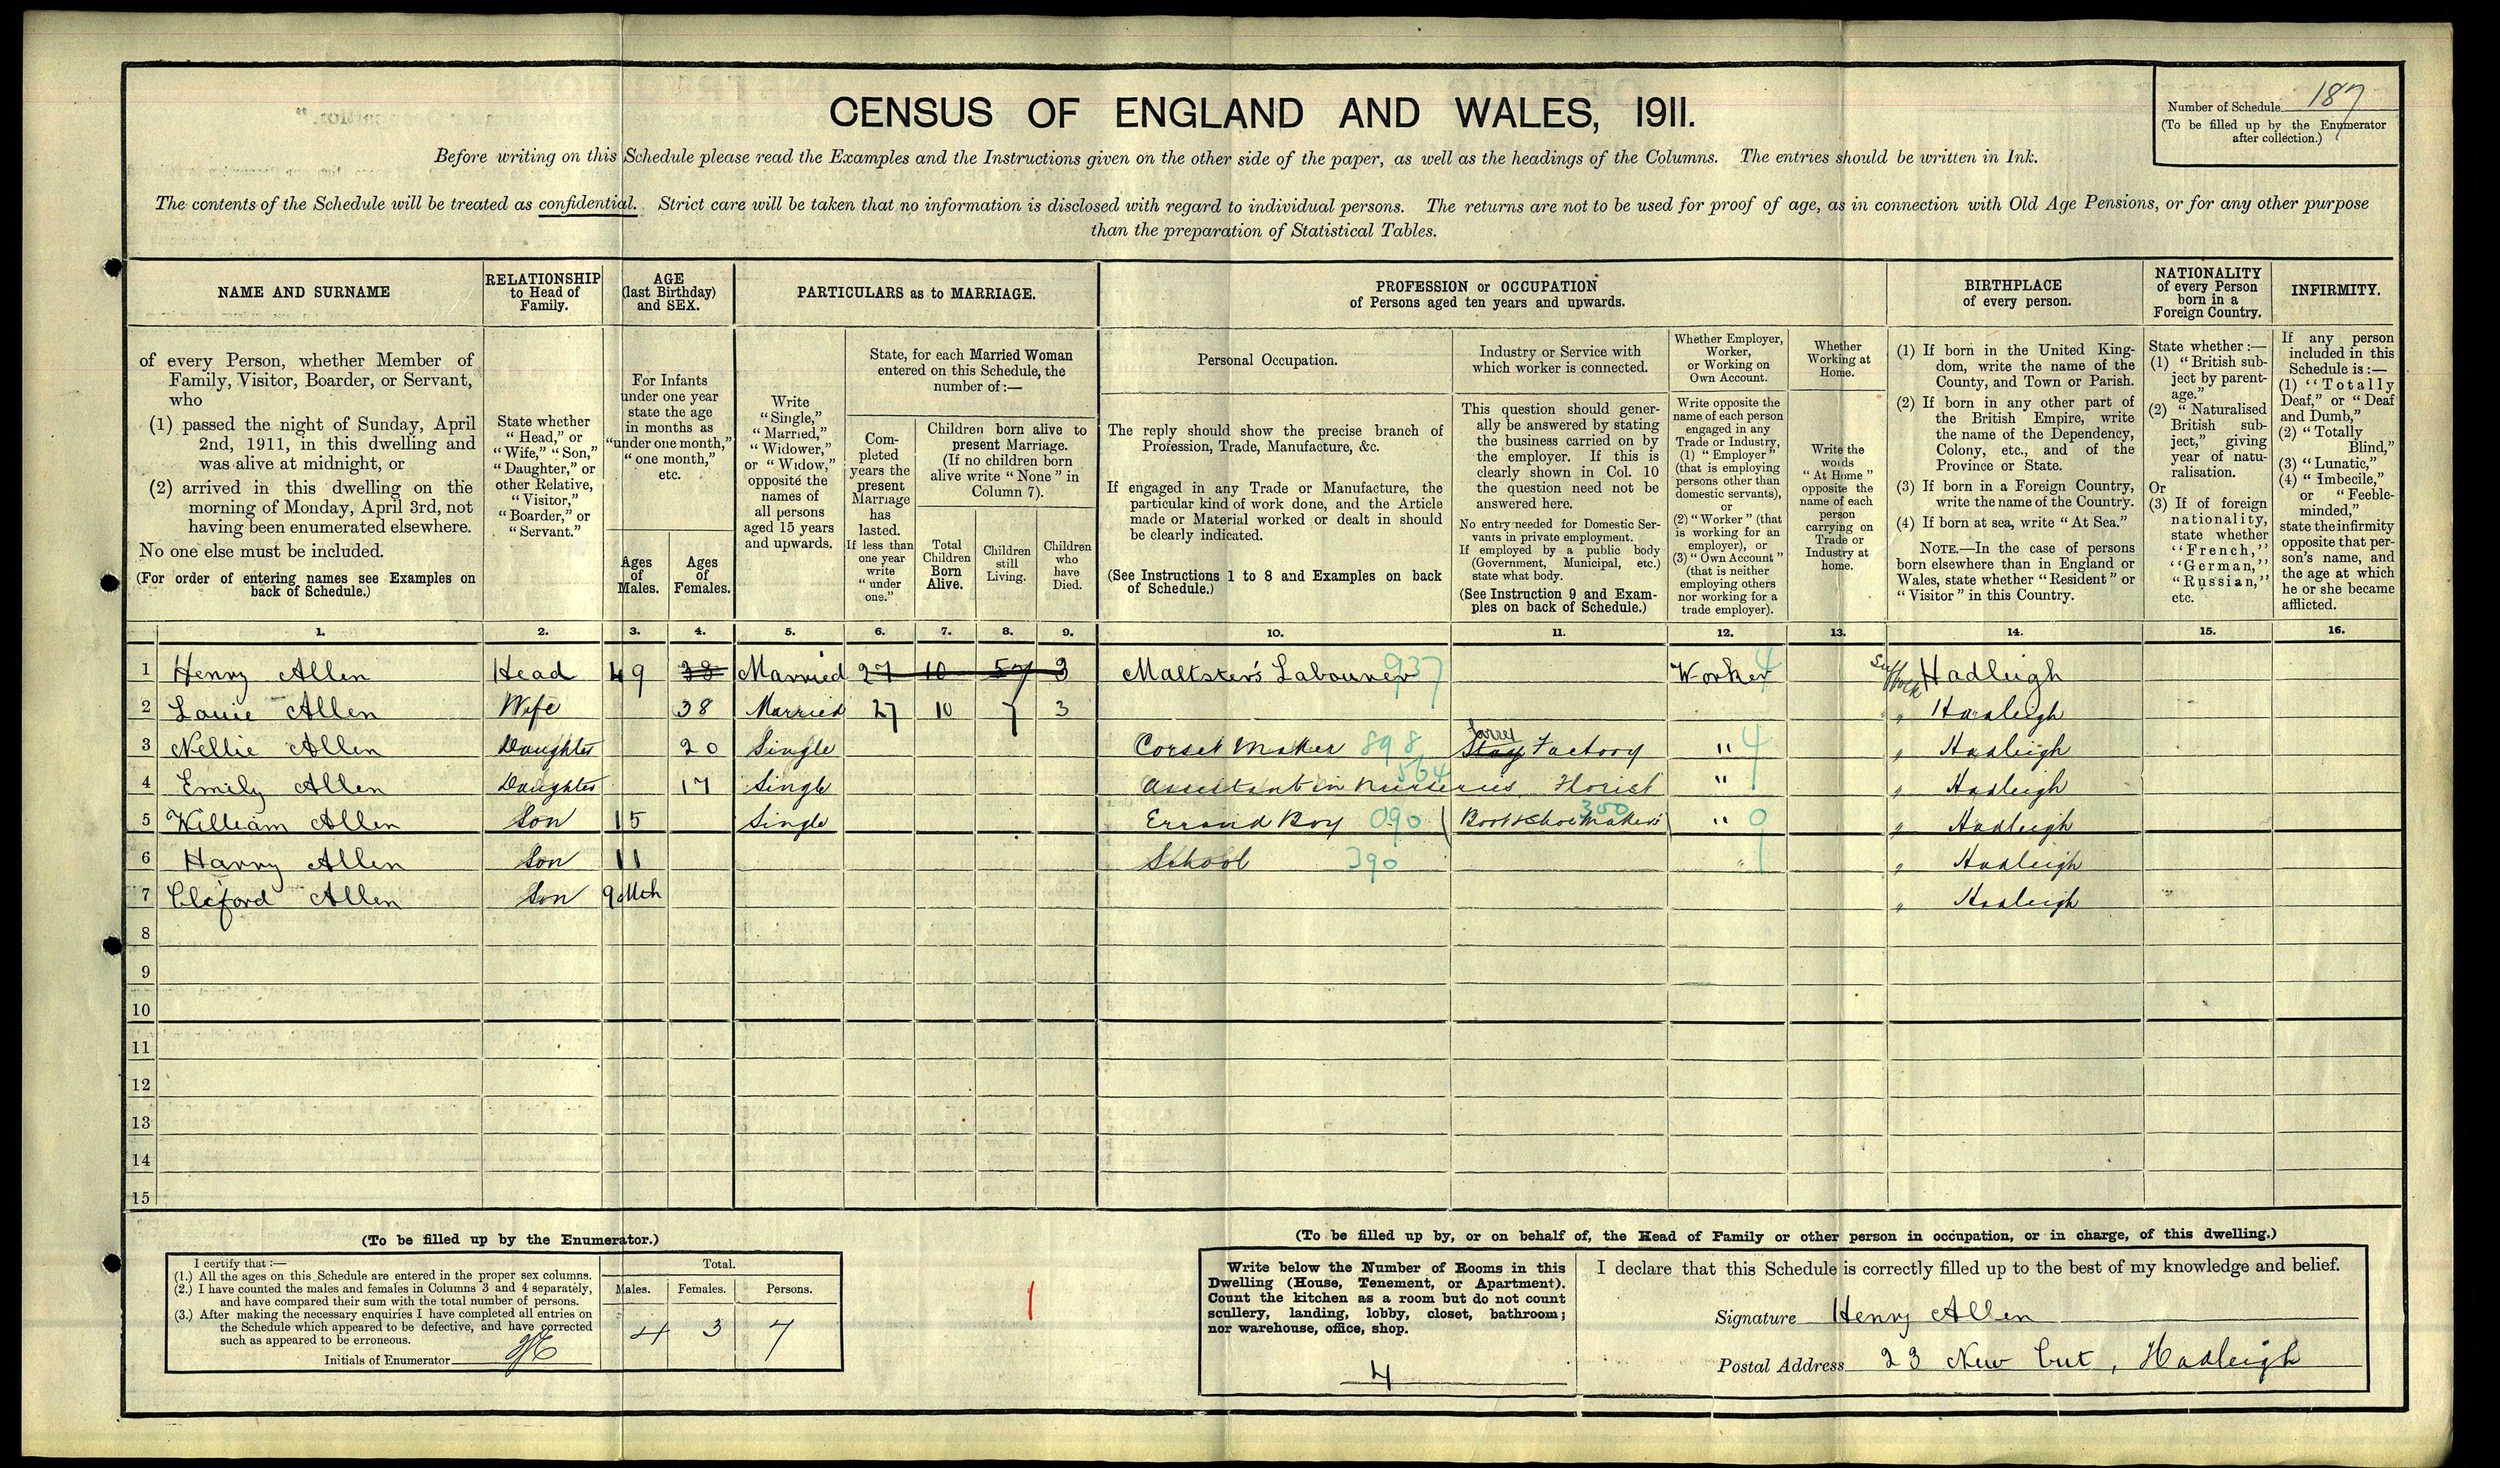 Harry Charles Allen 1911 Census.jpg